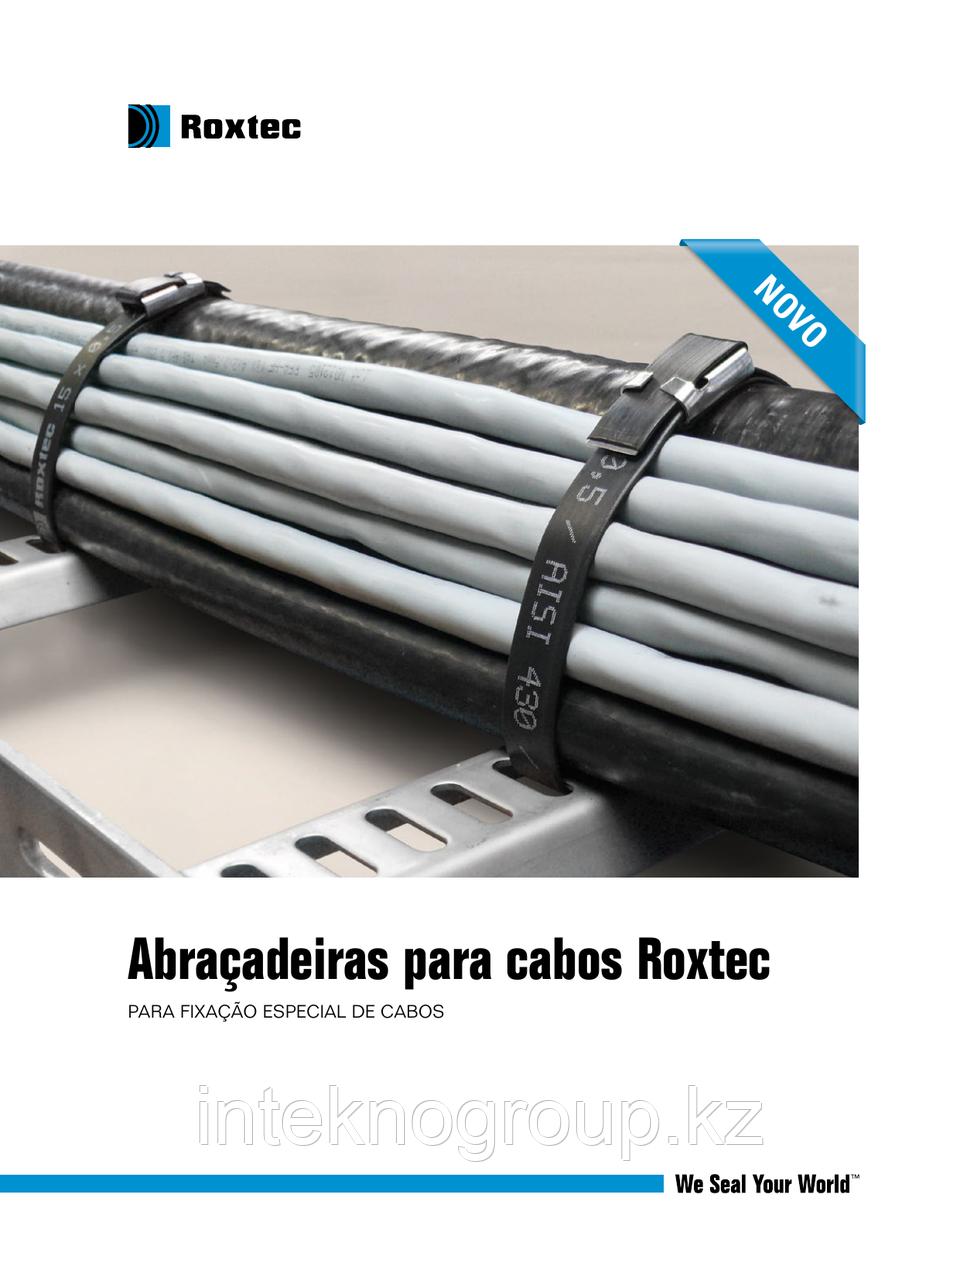 Roxtec Cable straps Strap 15x0,5 black/ss L=900 mm